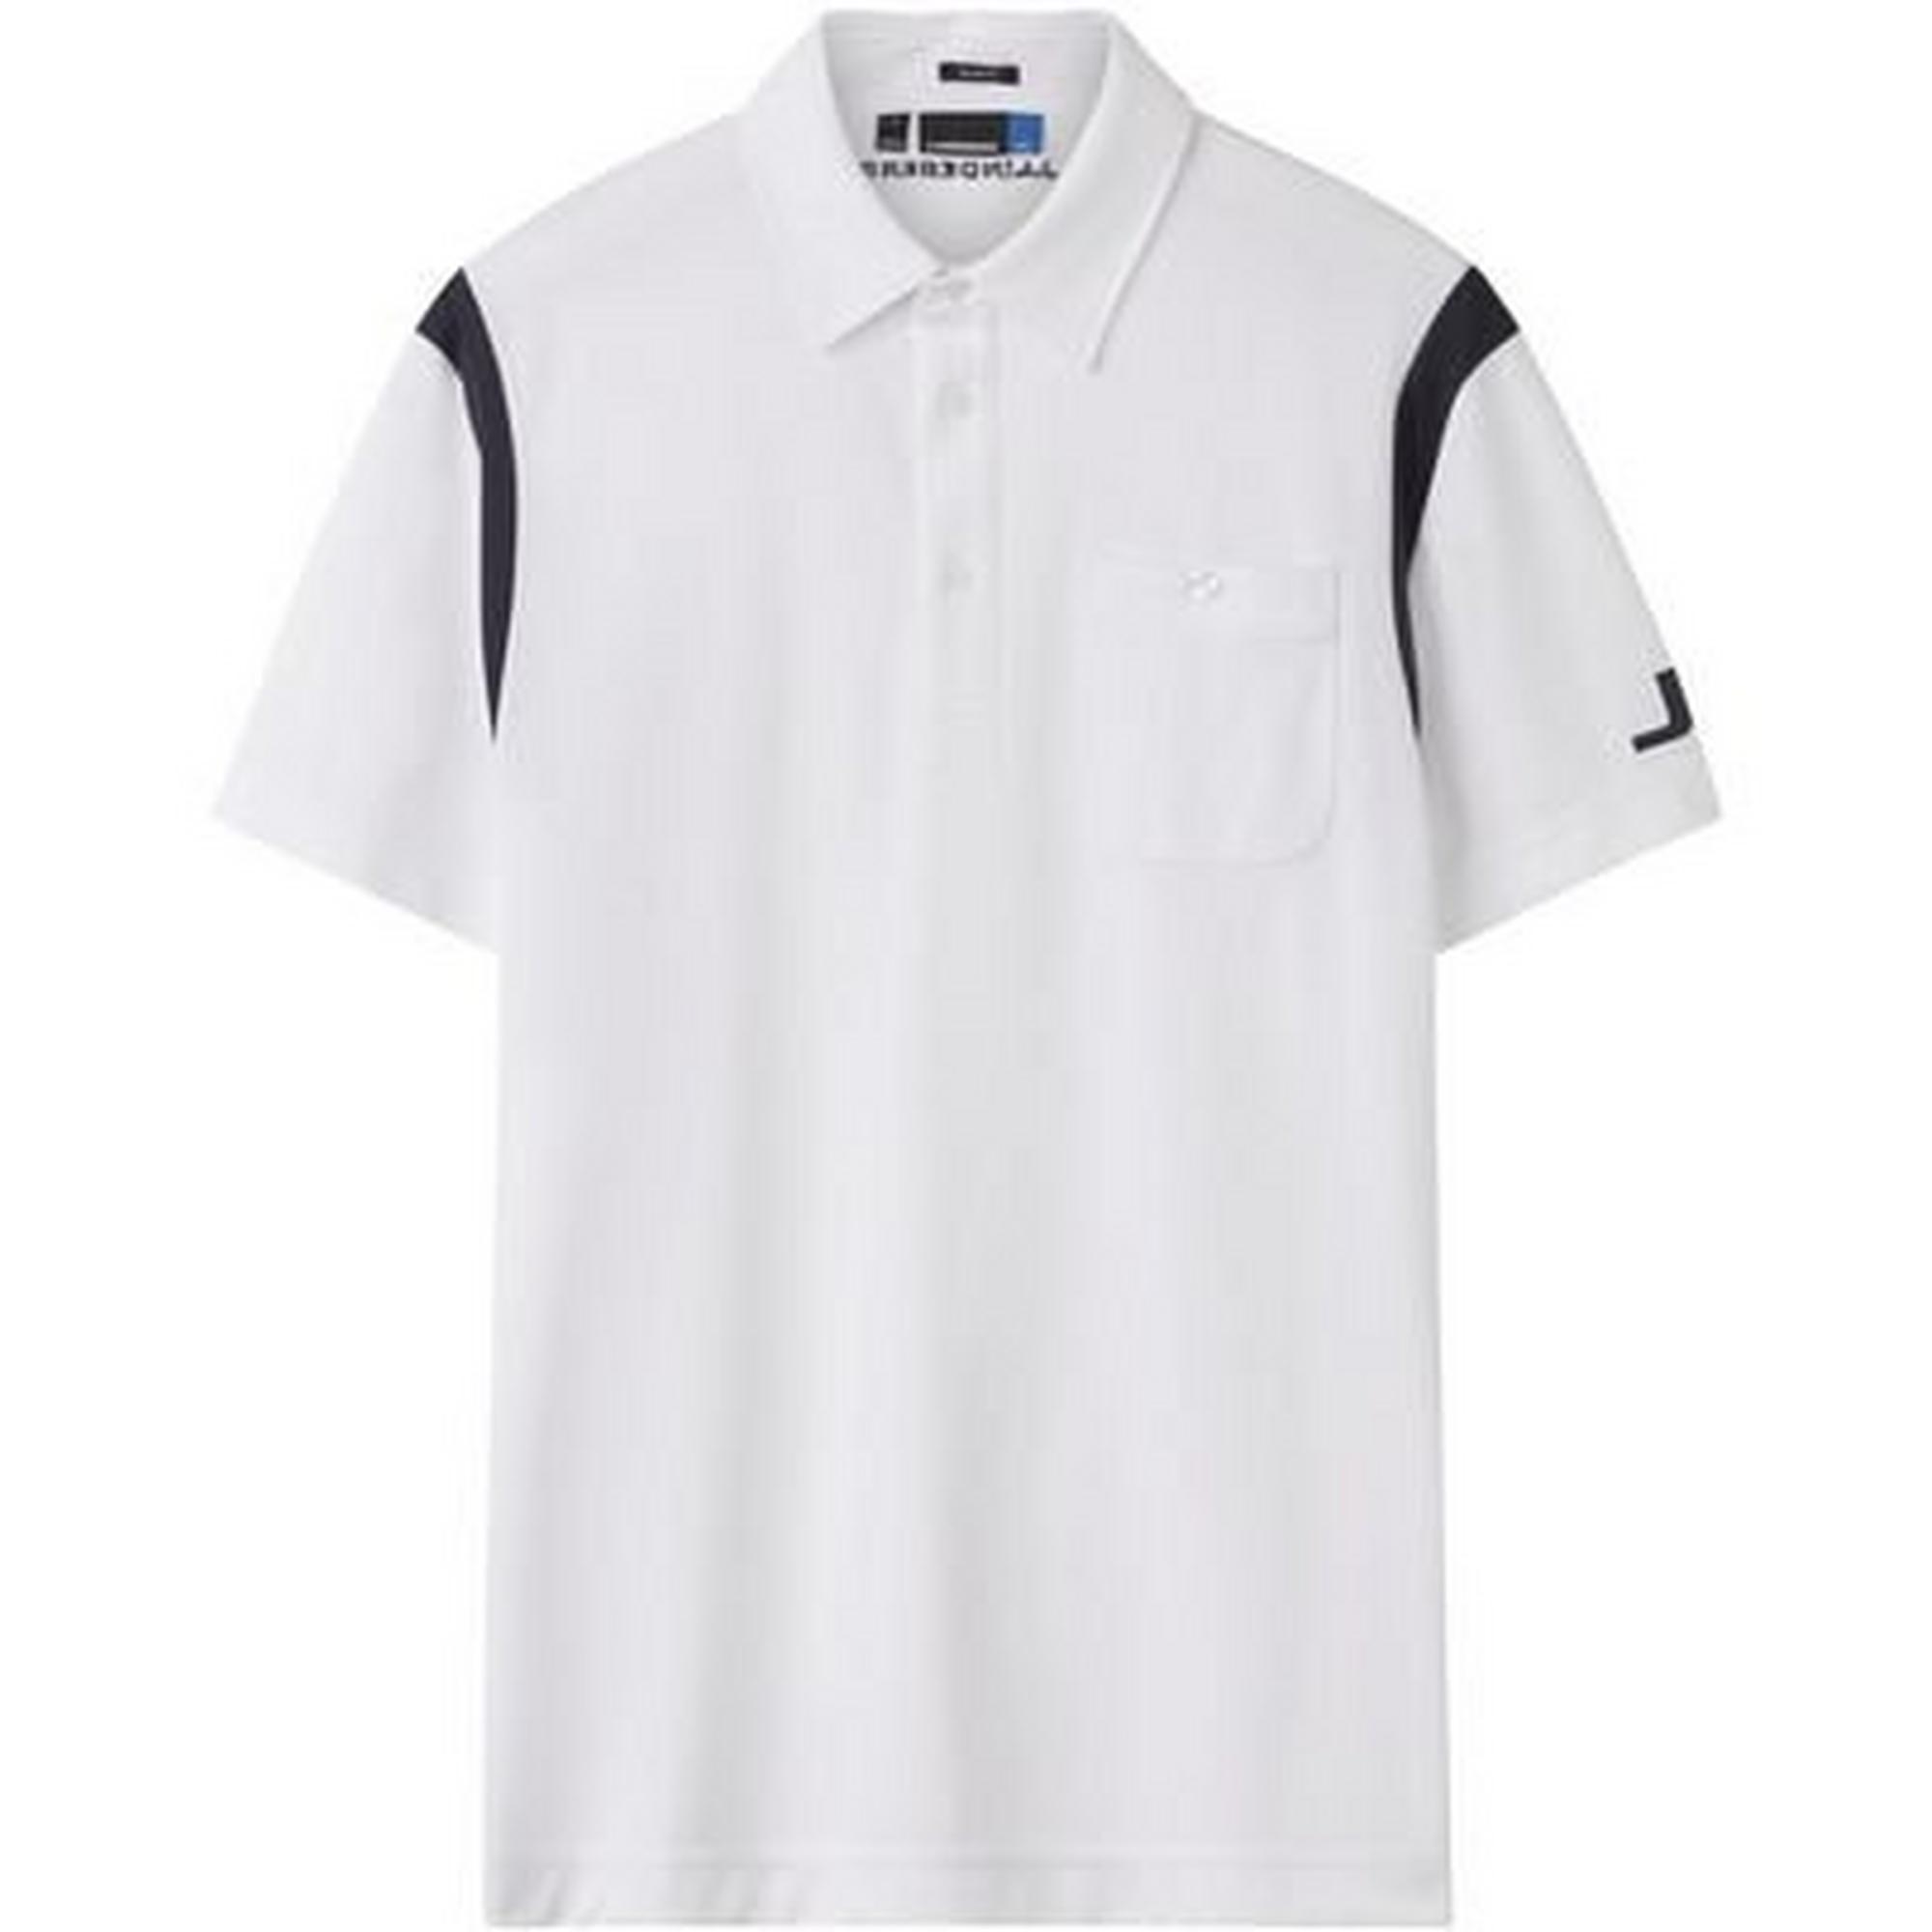 Men's Dolph Slim TX Jersey Short Sleeve Polo